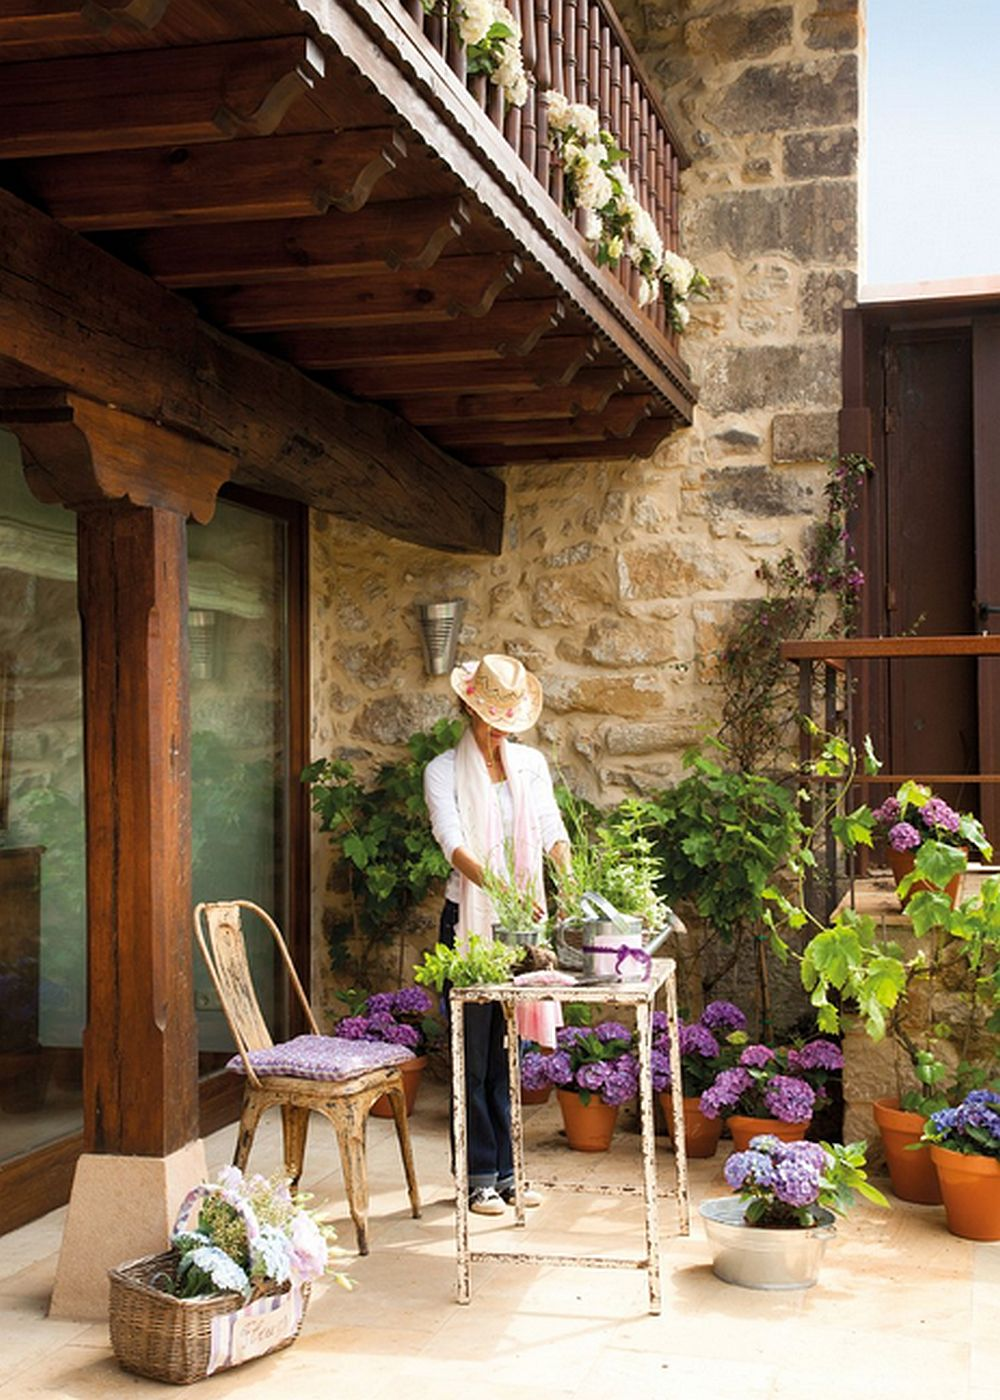 Casa taraneasca frumos modernizata  Adela Pârvu  jurnalist home